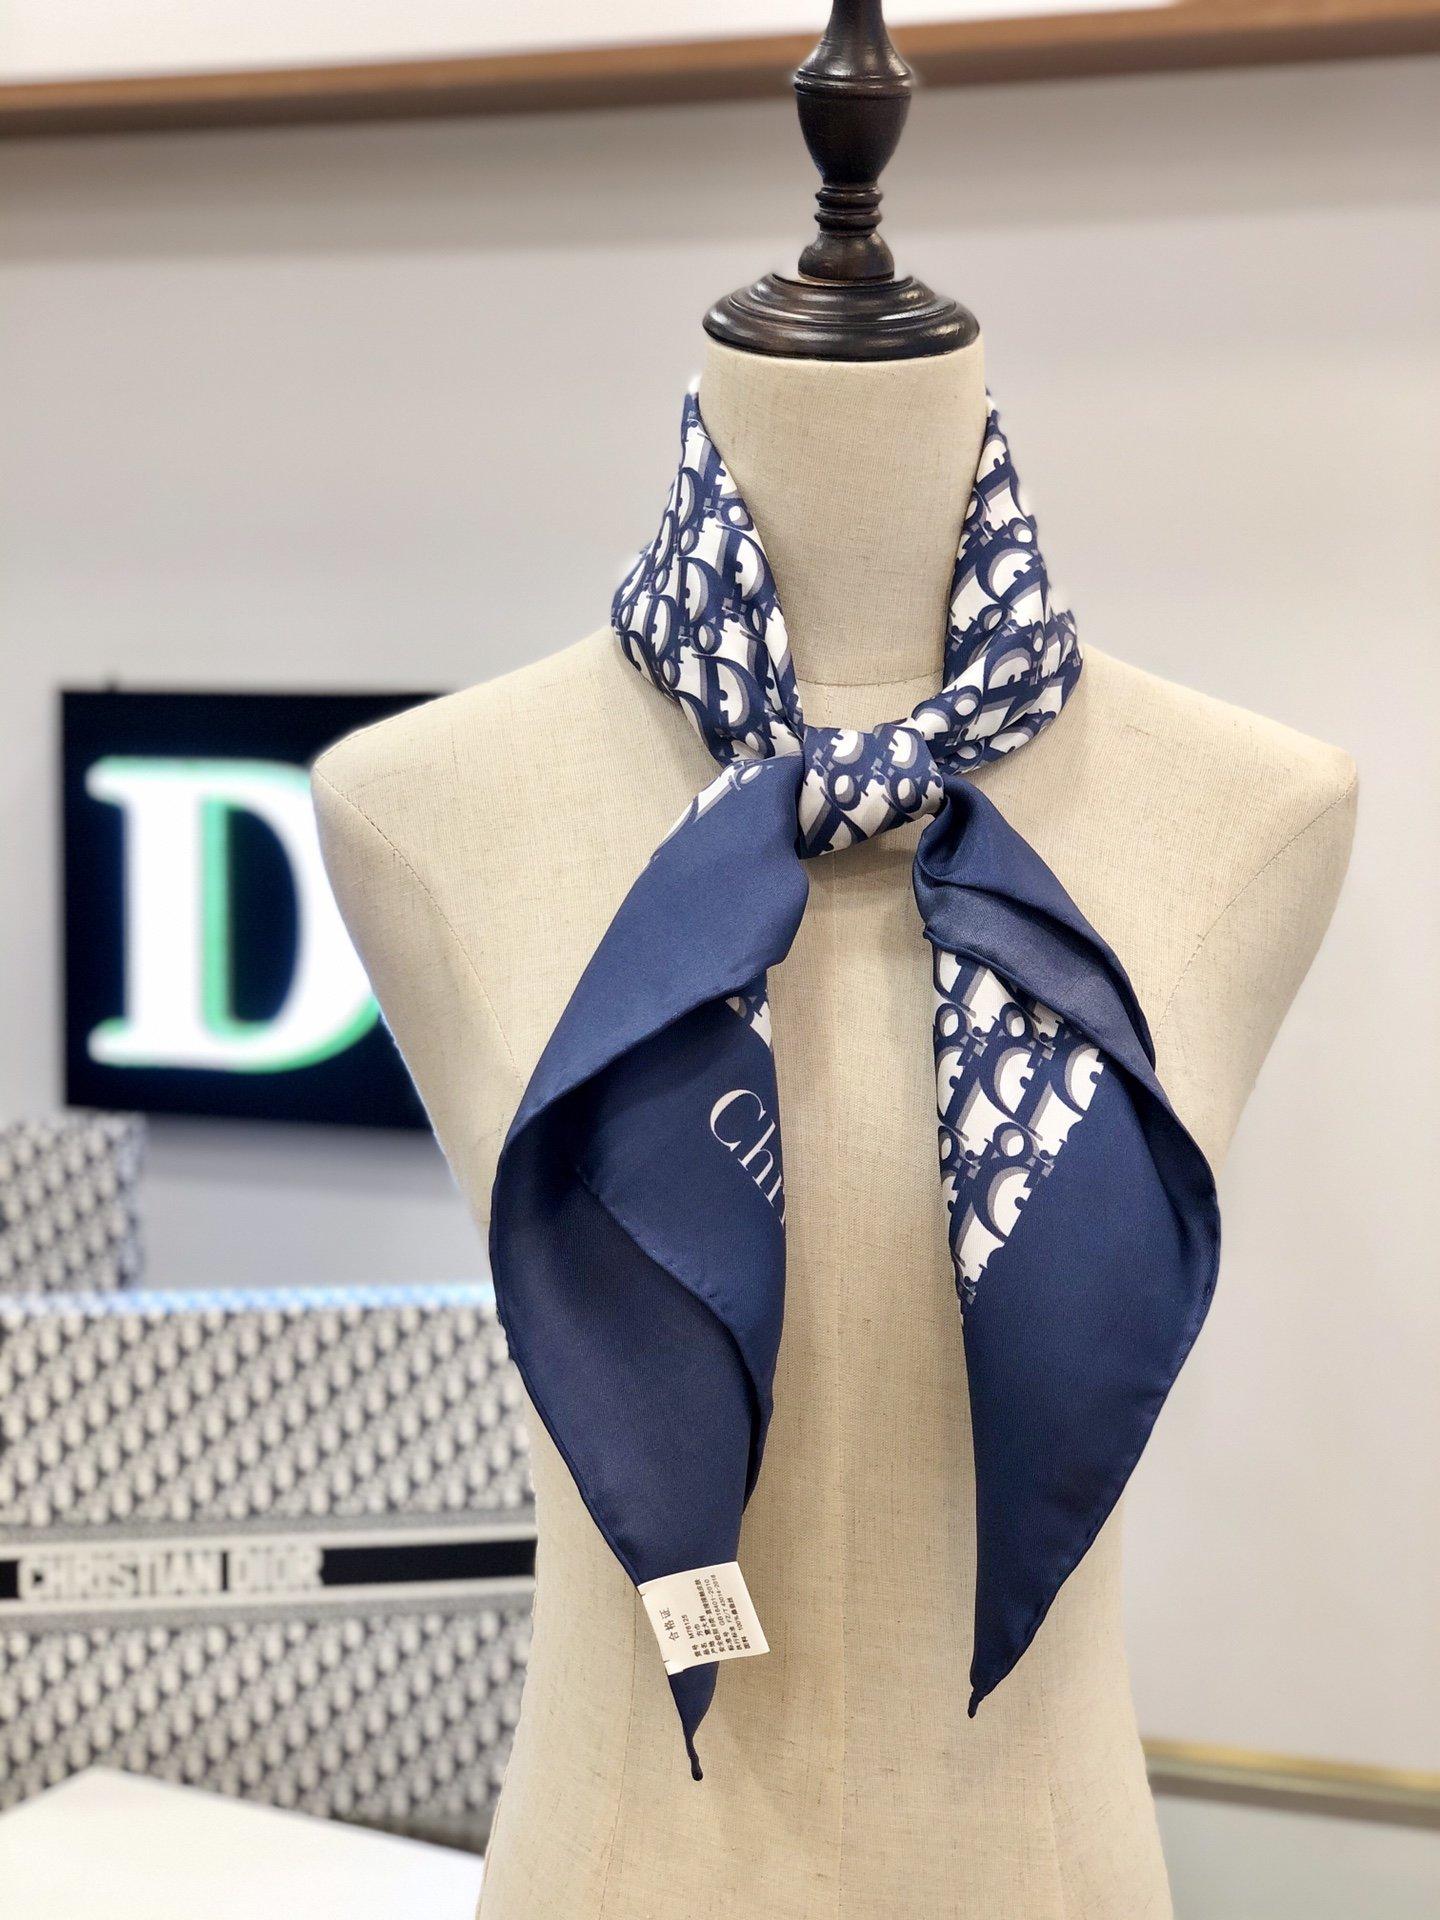 Dior丝巾 100%真丝 手工卷边丝巾 专柜有 售